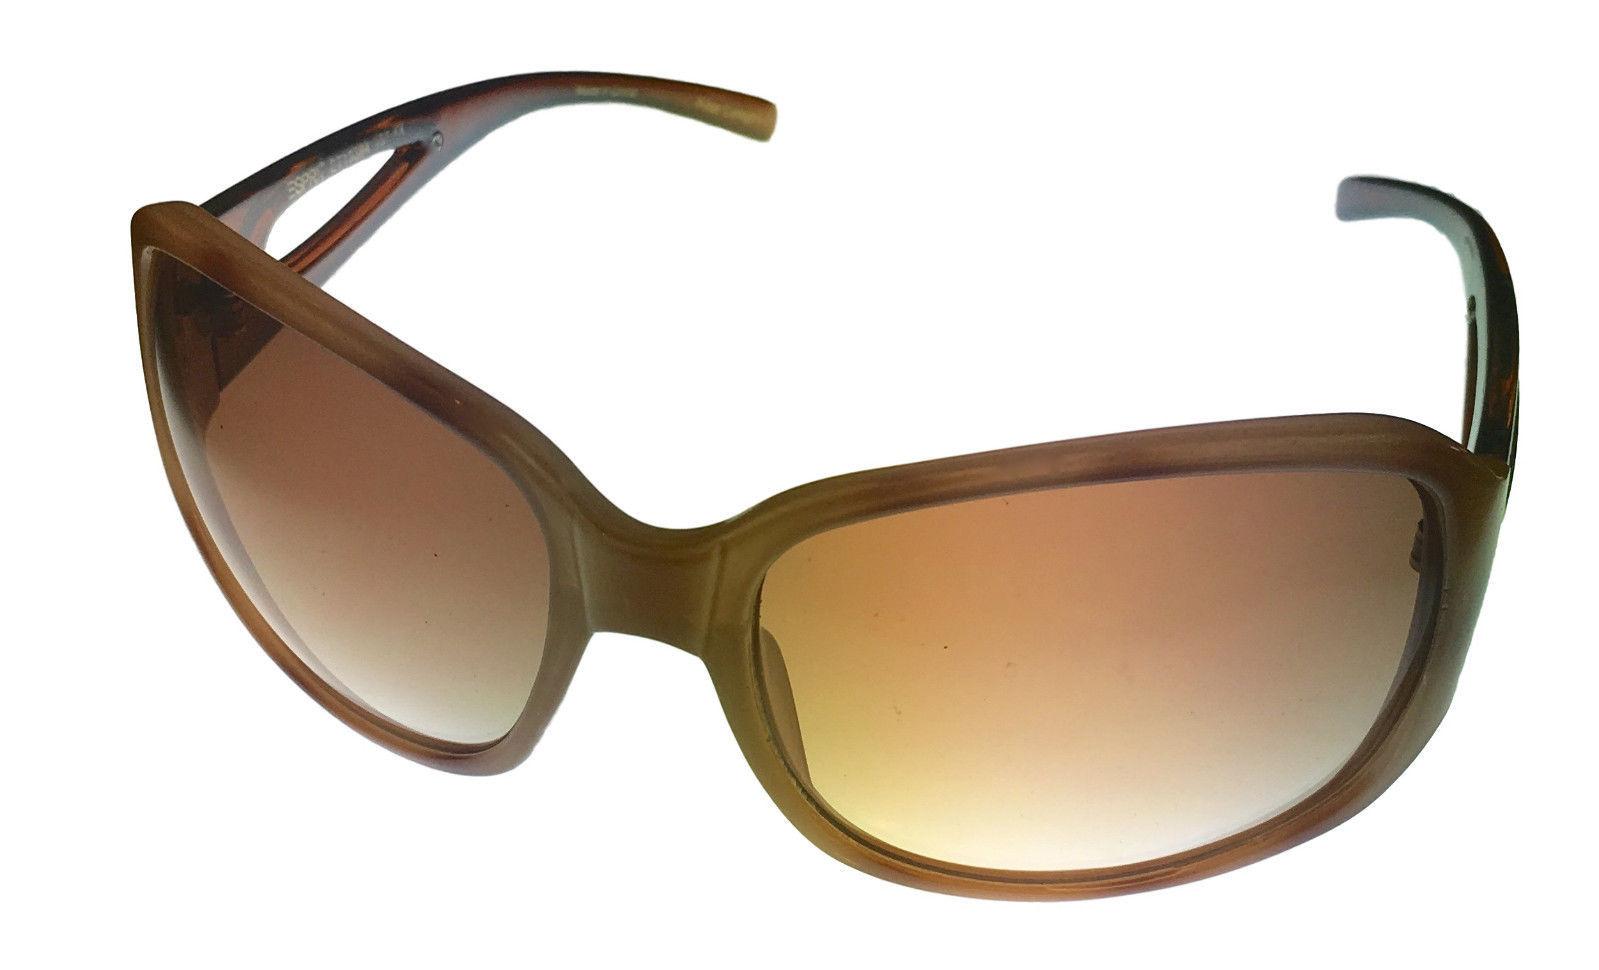 bd24aff4519 Esprit Womens Sunglass 19394 558 Beige Brown Rectangle Plastic